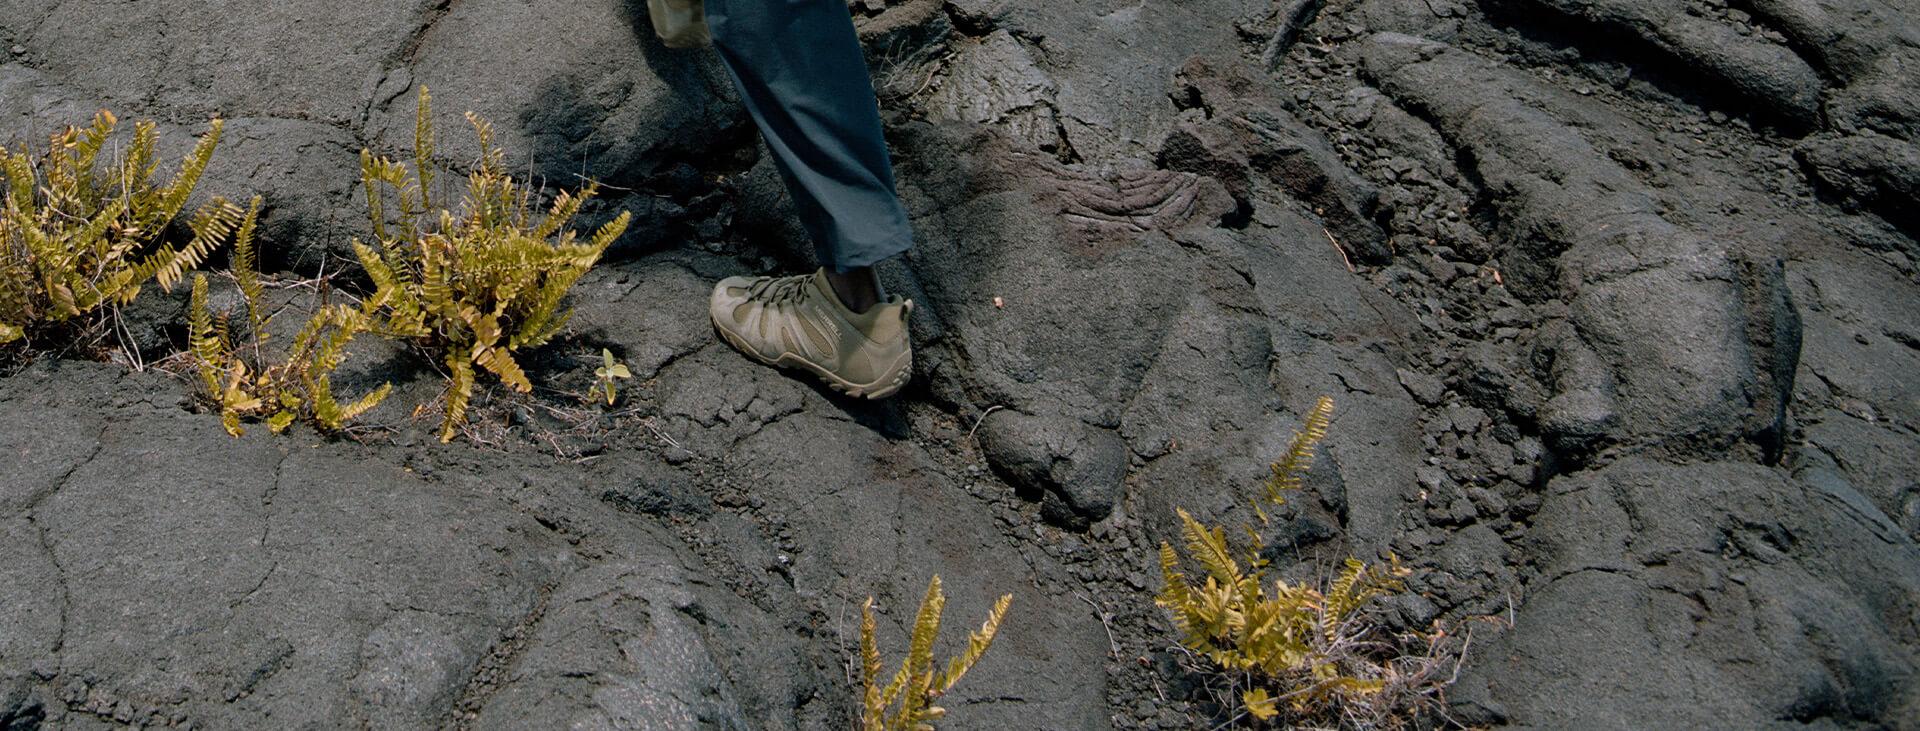 Walking over rocks.